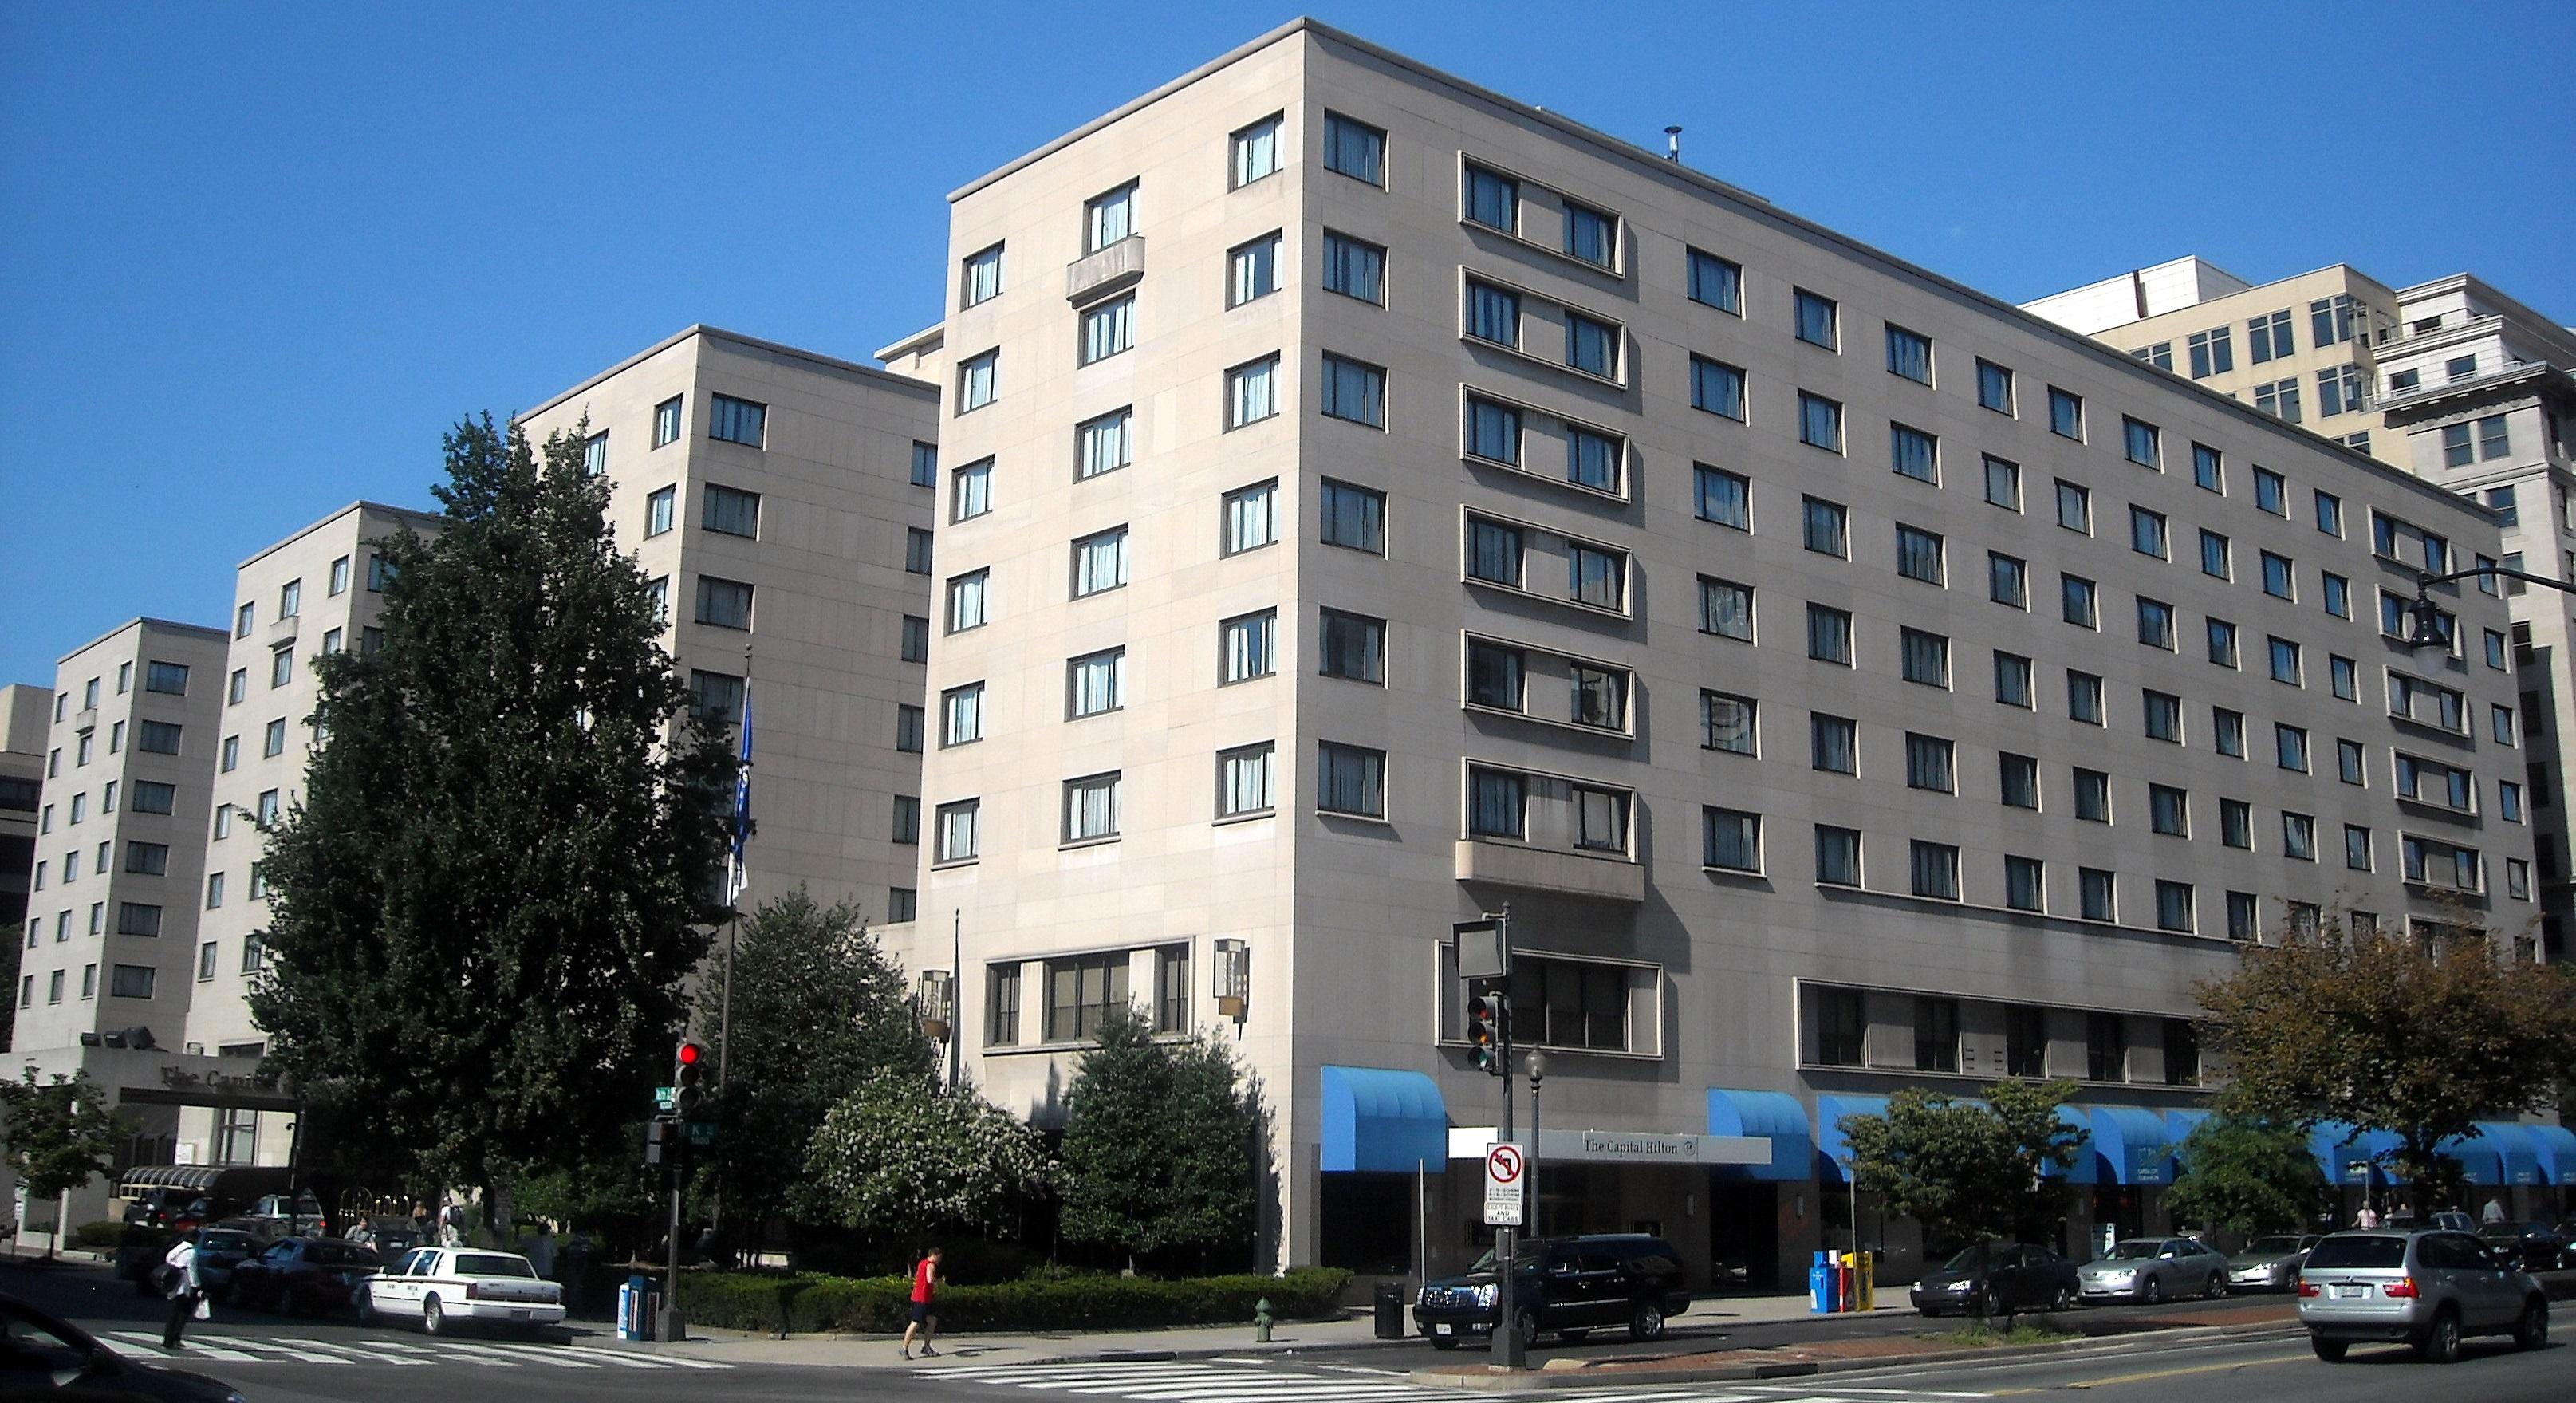 Capital Hilton Hotel Dc